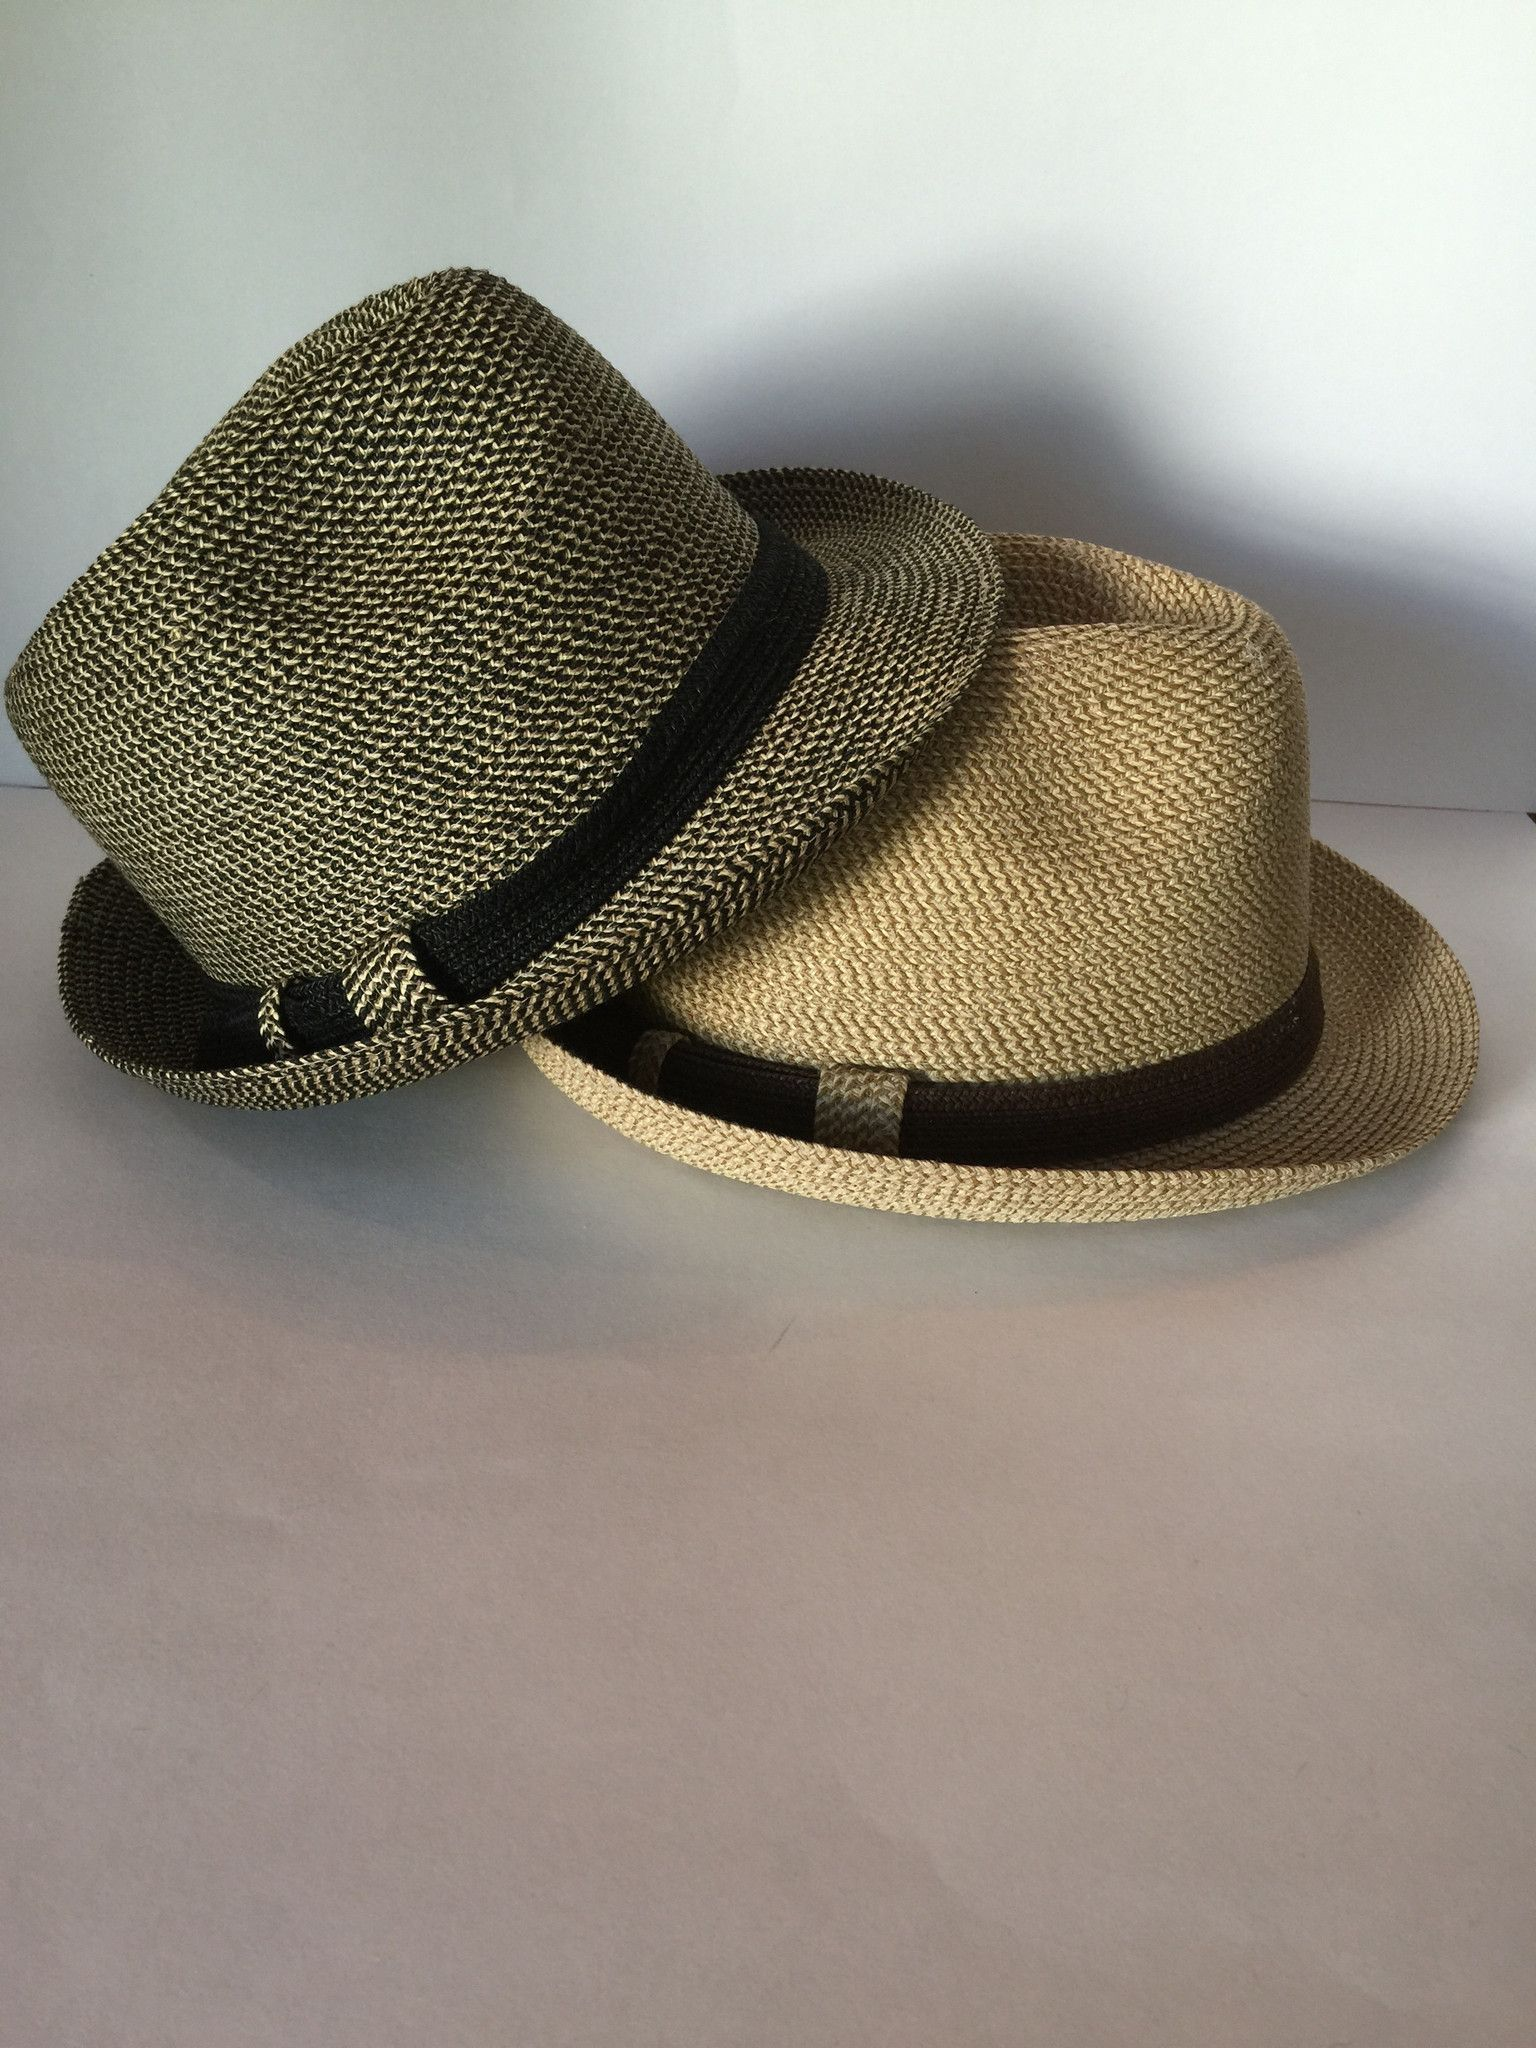 de553ac74f7 Women or teen choice of Black or Tan Tweed fedora with SPF 50 ...